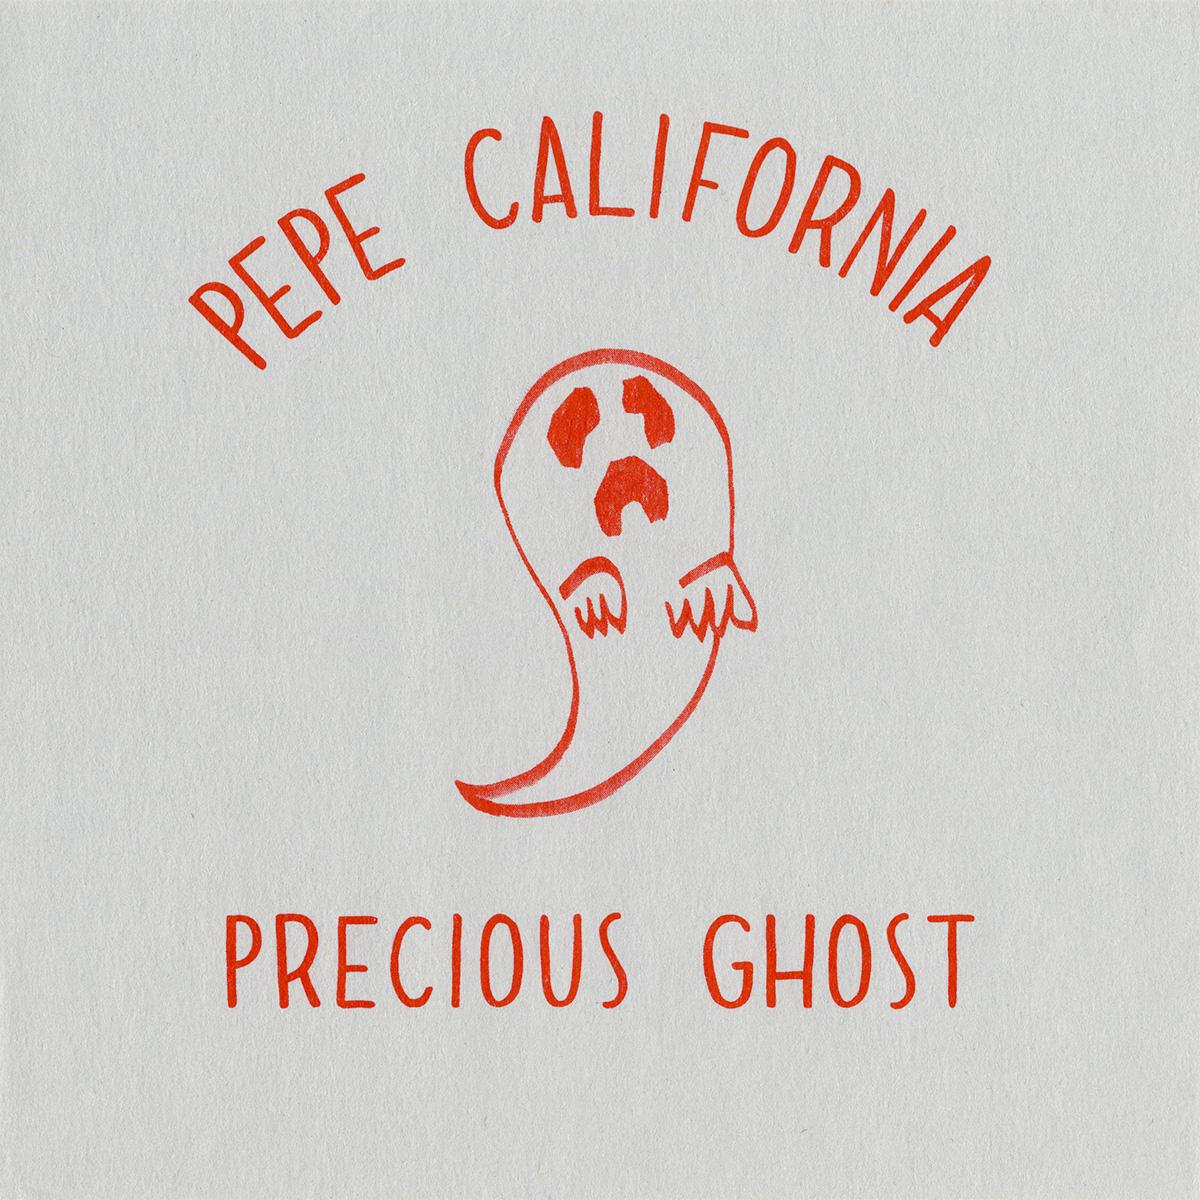 Precious Ghost